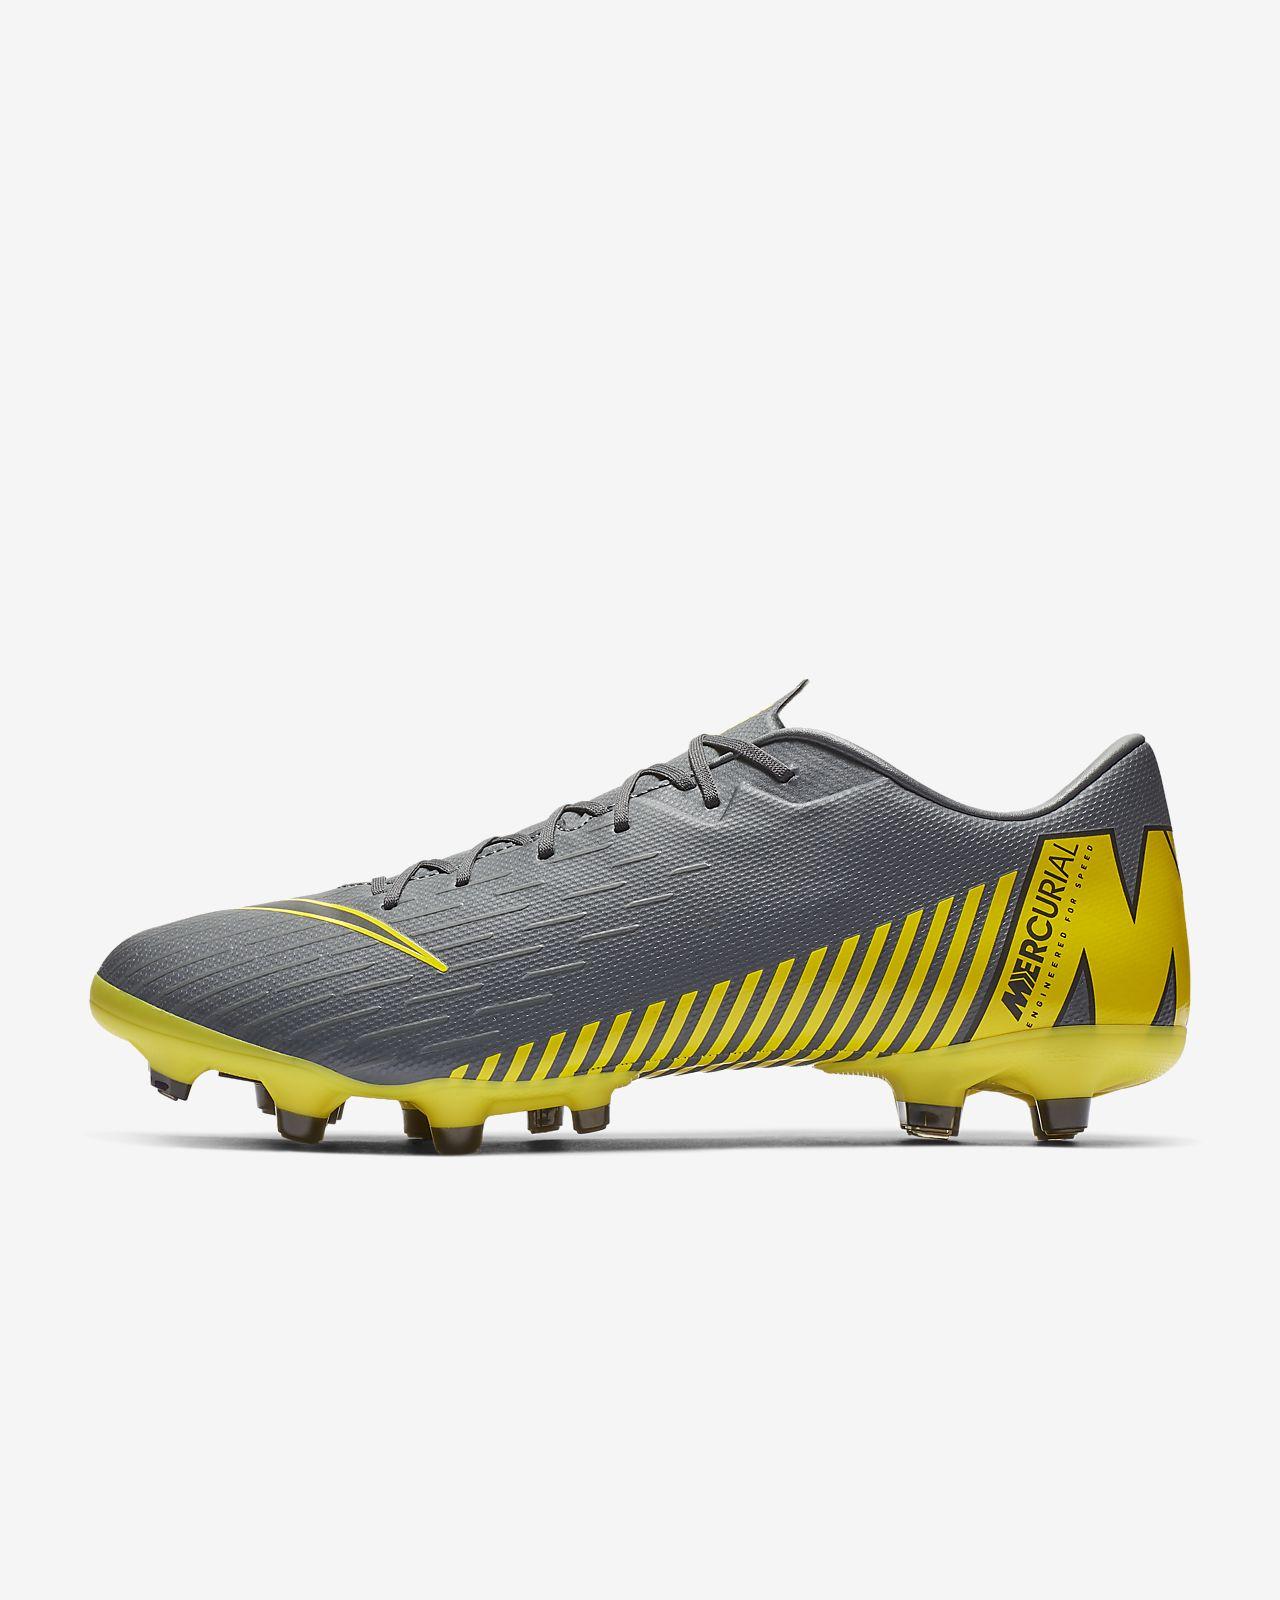 3ca6f618cd0 Nike Vapor 12 Academy MG Multi-Ground Football Boot. Nike.com SK